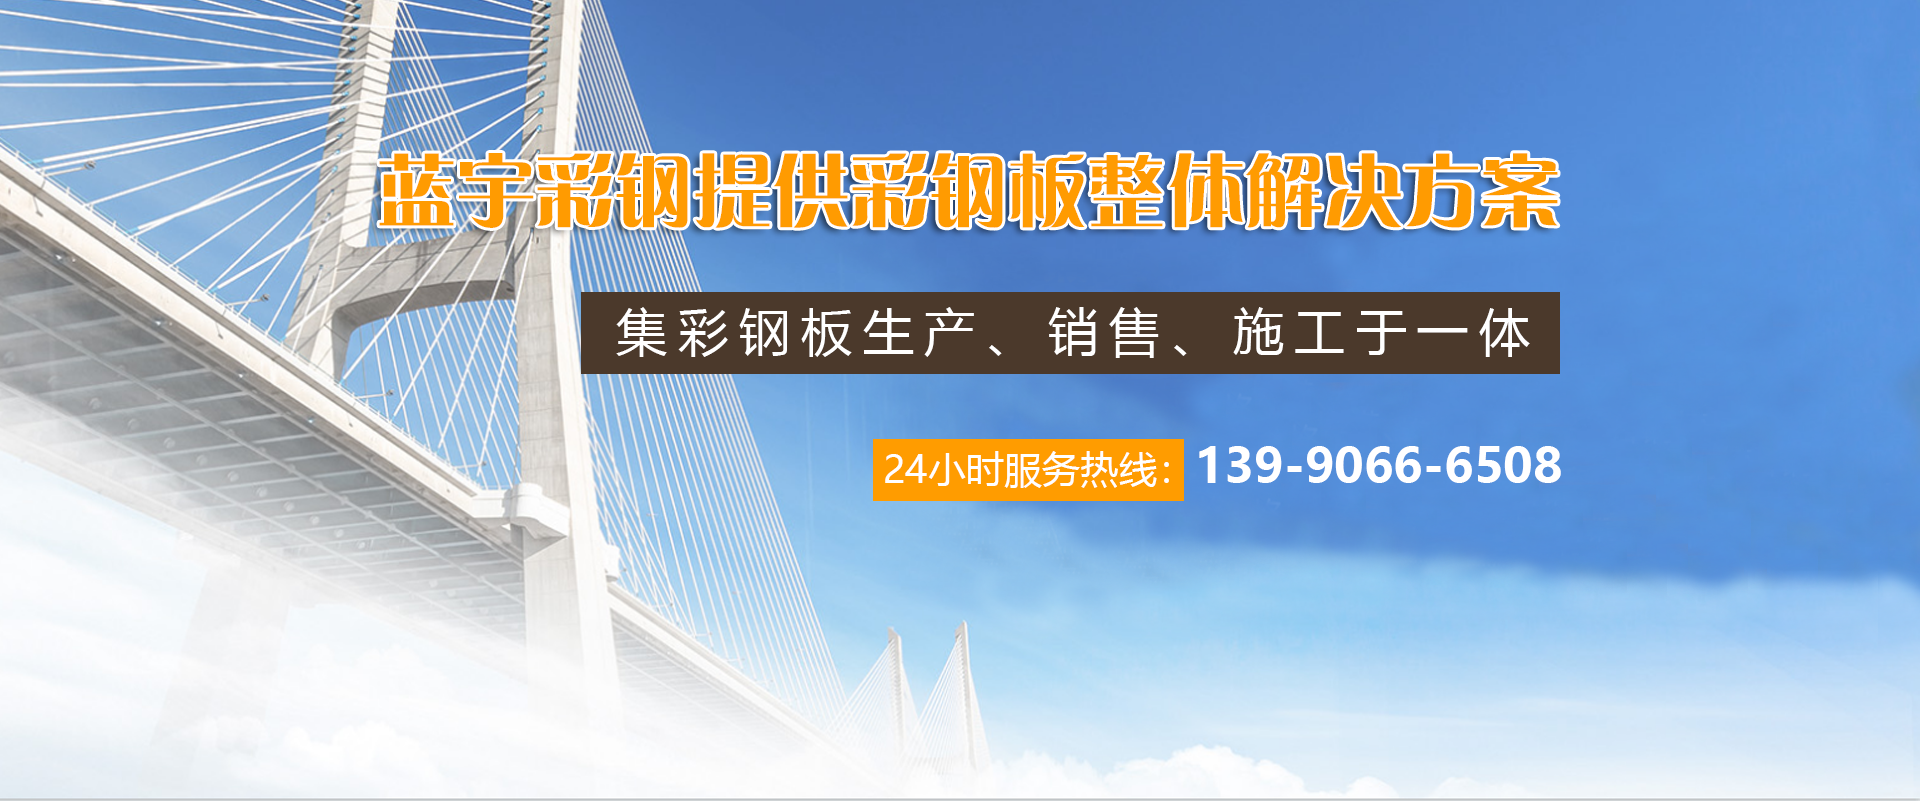 http://www.lanyucgcj.com/data/upload/202101/20210115144110_463.png